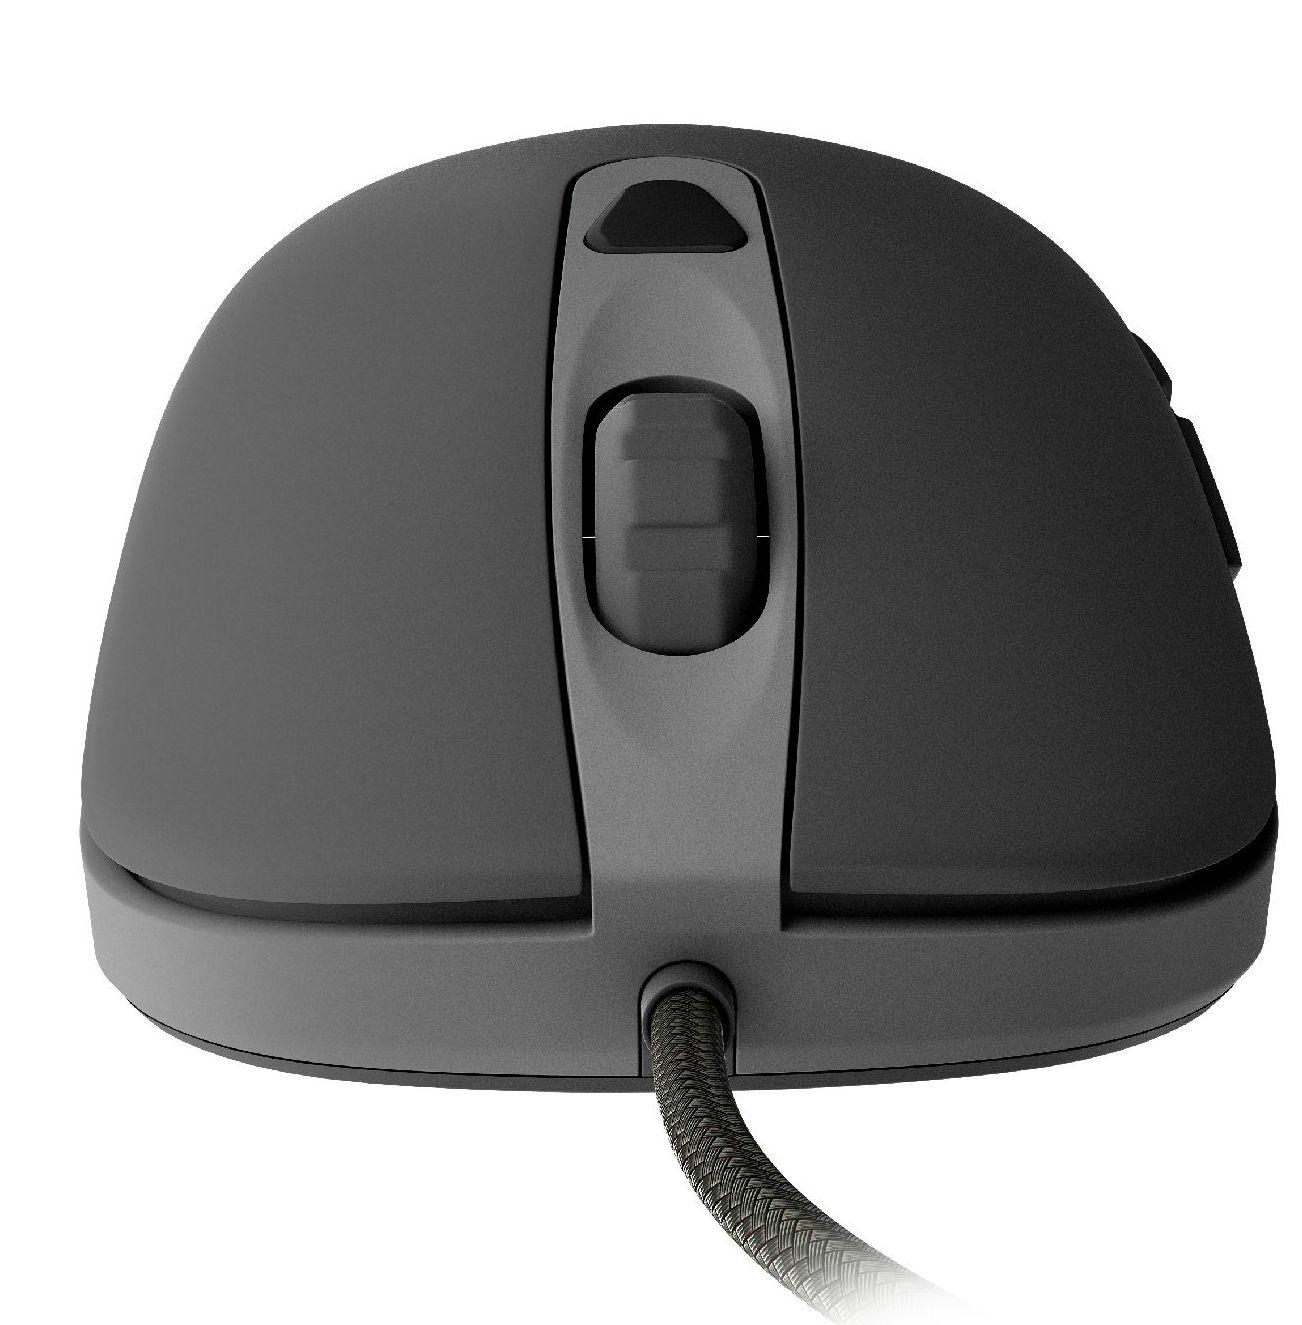 Гейминг мишка Genesis - Krypton 190, жична, оптична, черна - 6